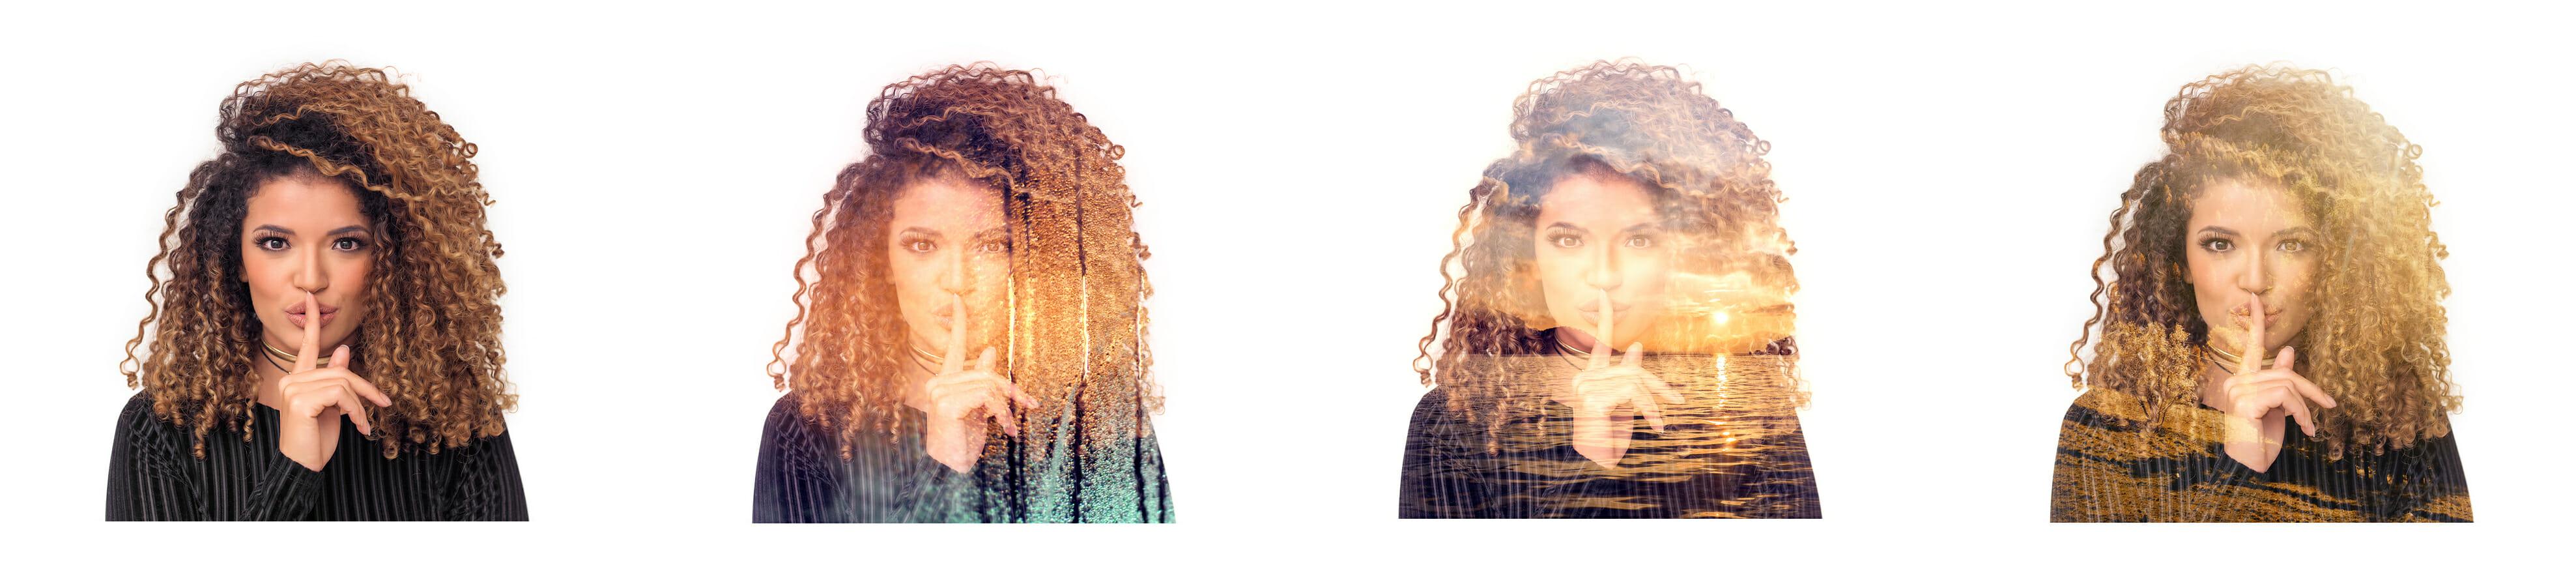 iphotography multiple exposure female